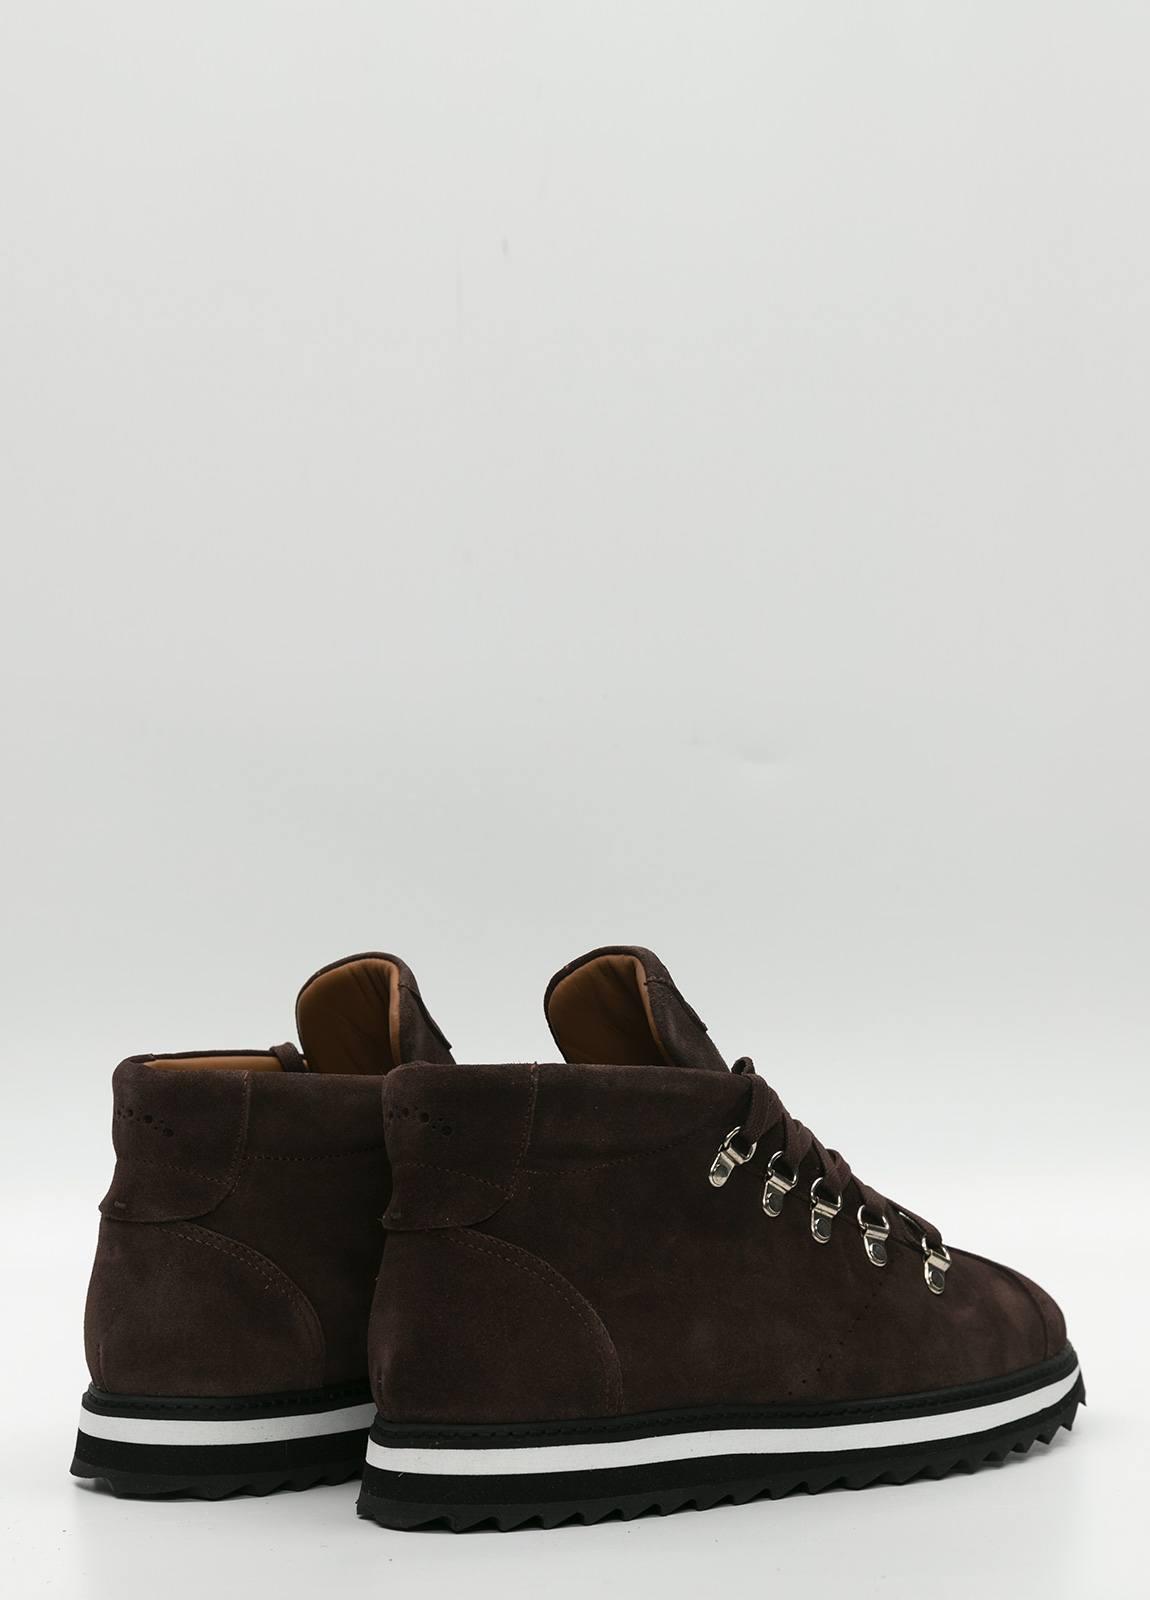 Bota sport de cordones, color marrón oscuro. 100% Piel Ante. - Ítem3